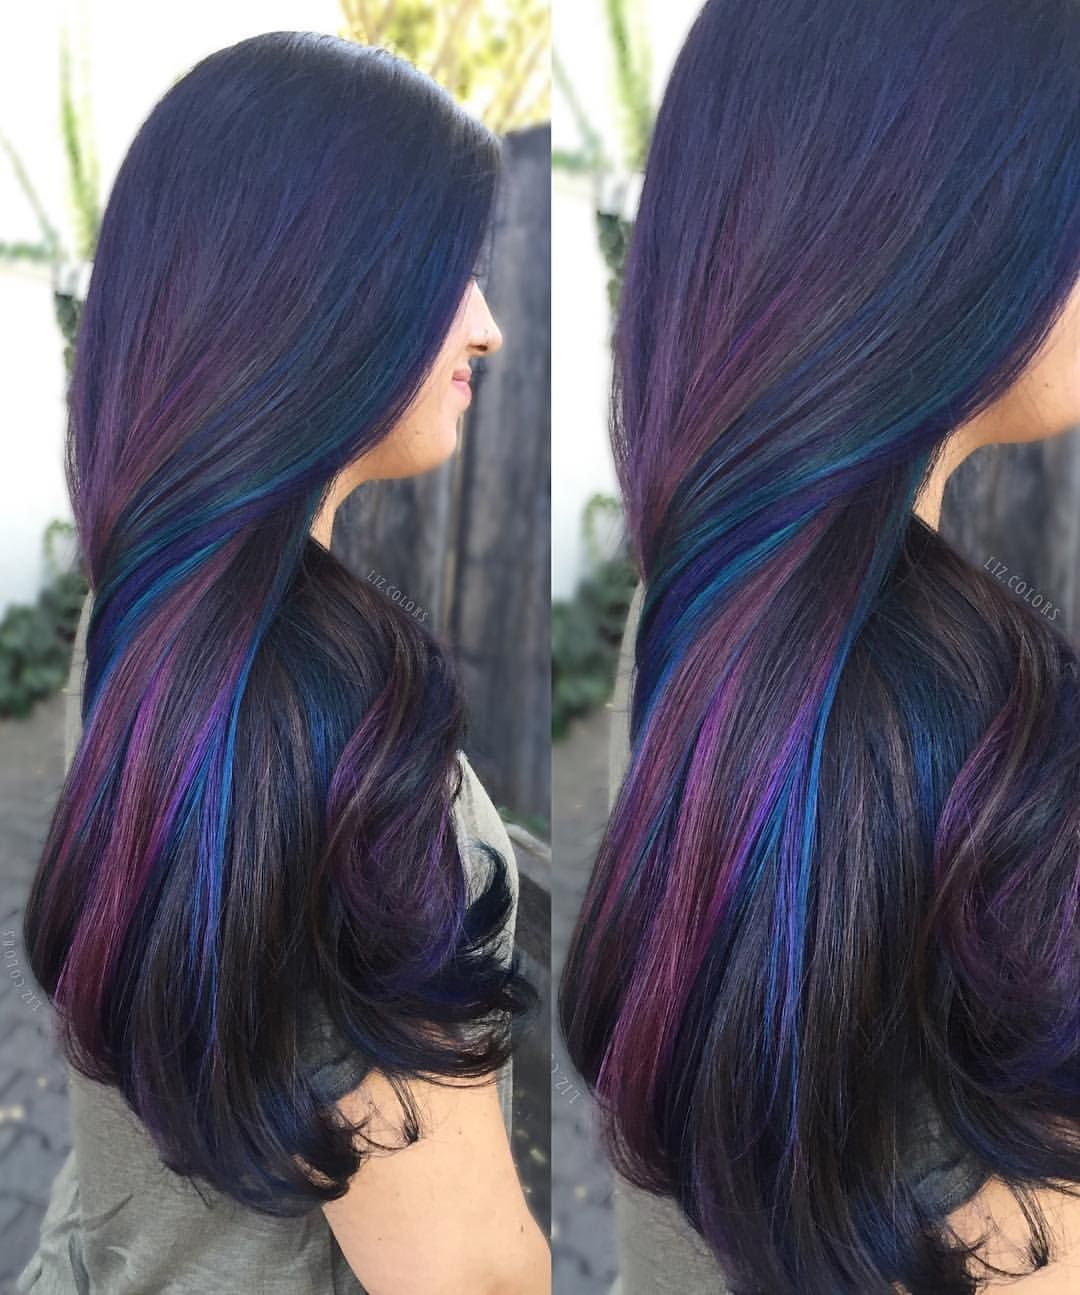 Hair Inspiration 2 831 Likes 37